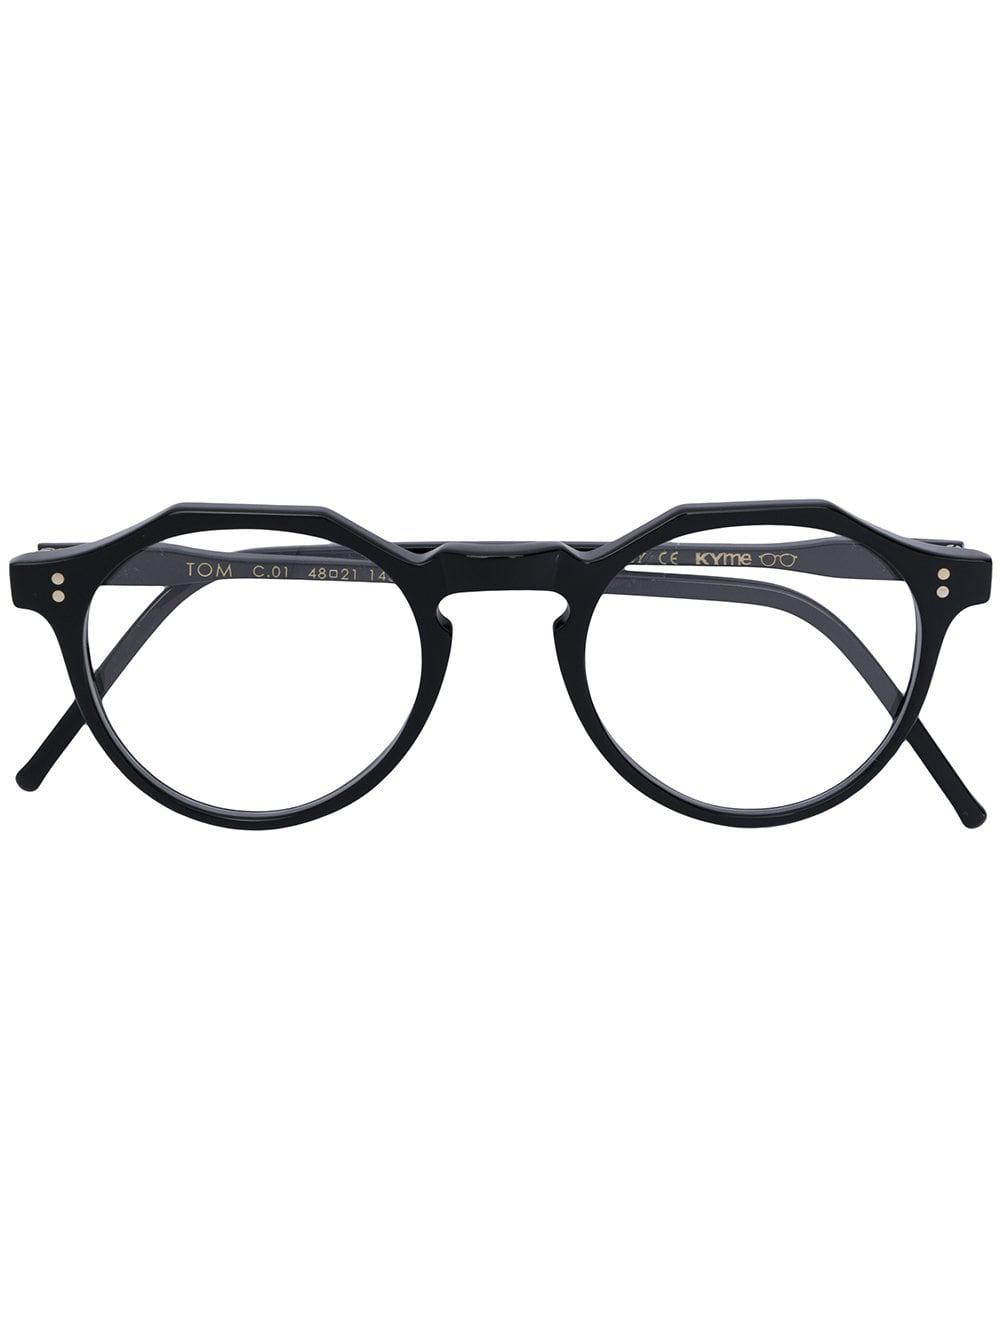 d115cc820b69 Kyme Tom Round Frame Glasses in Black - Lyst